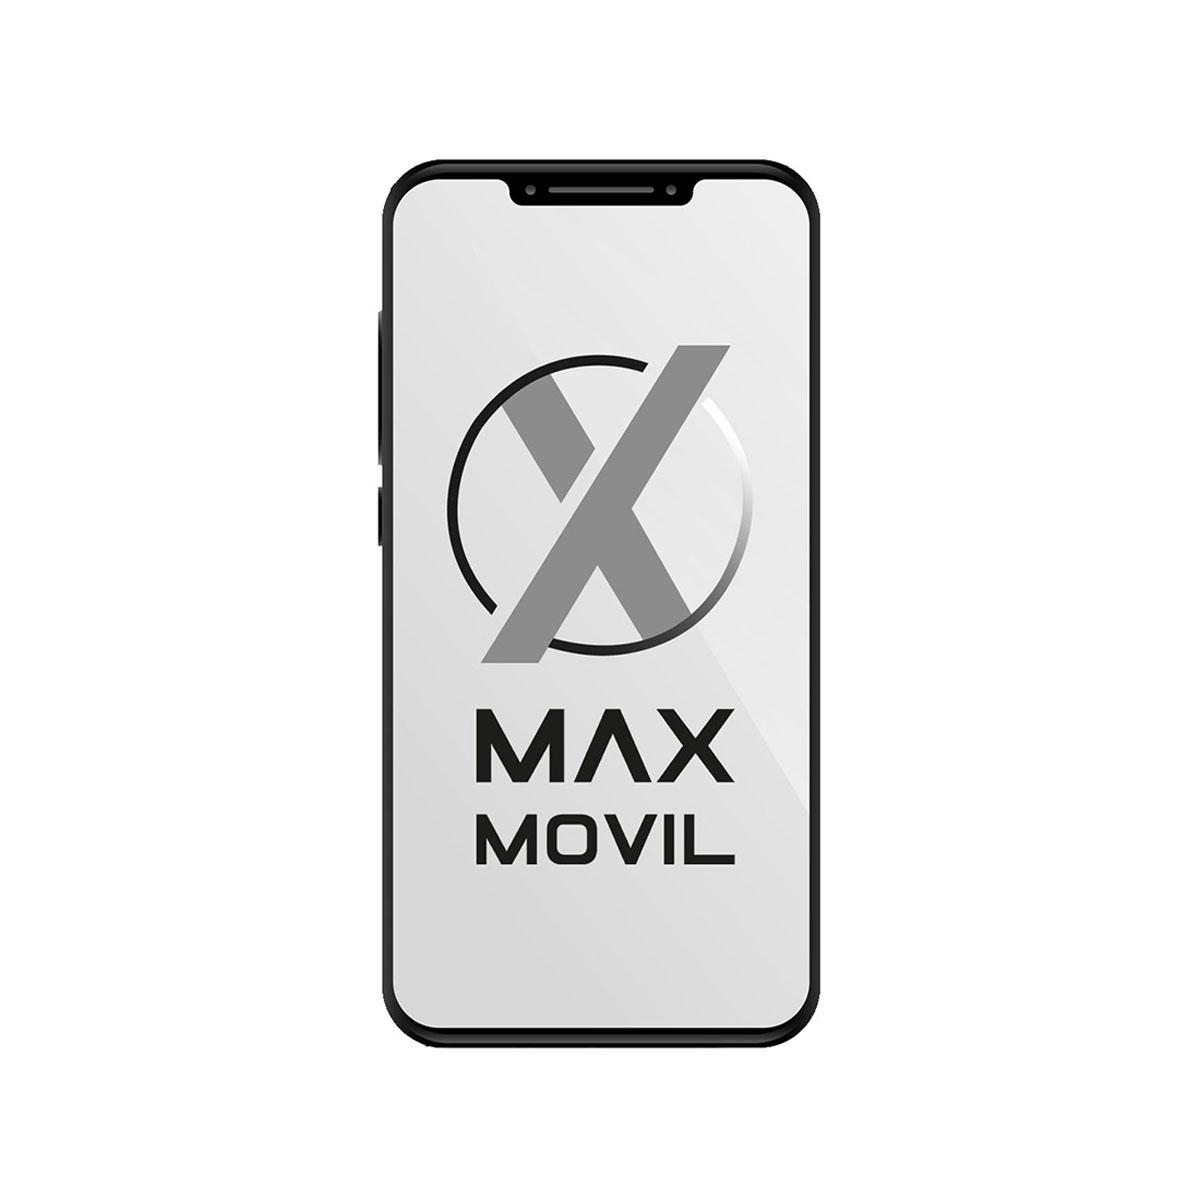 Tapa de batería original Samsung Galaxy S3 mini blanco